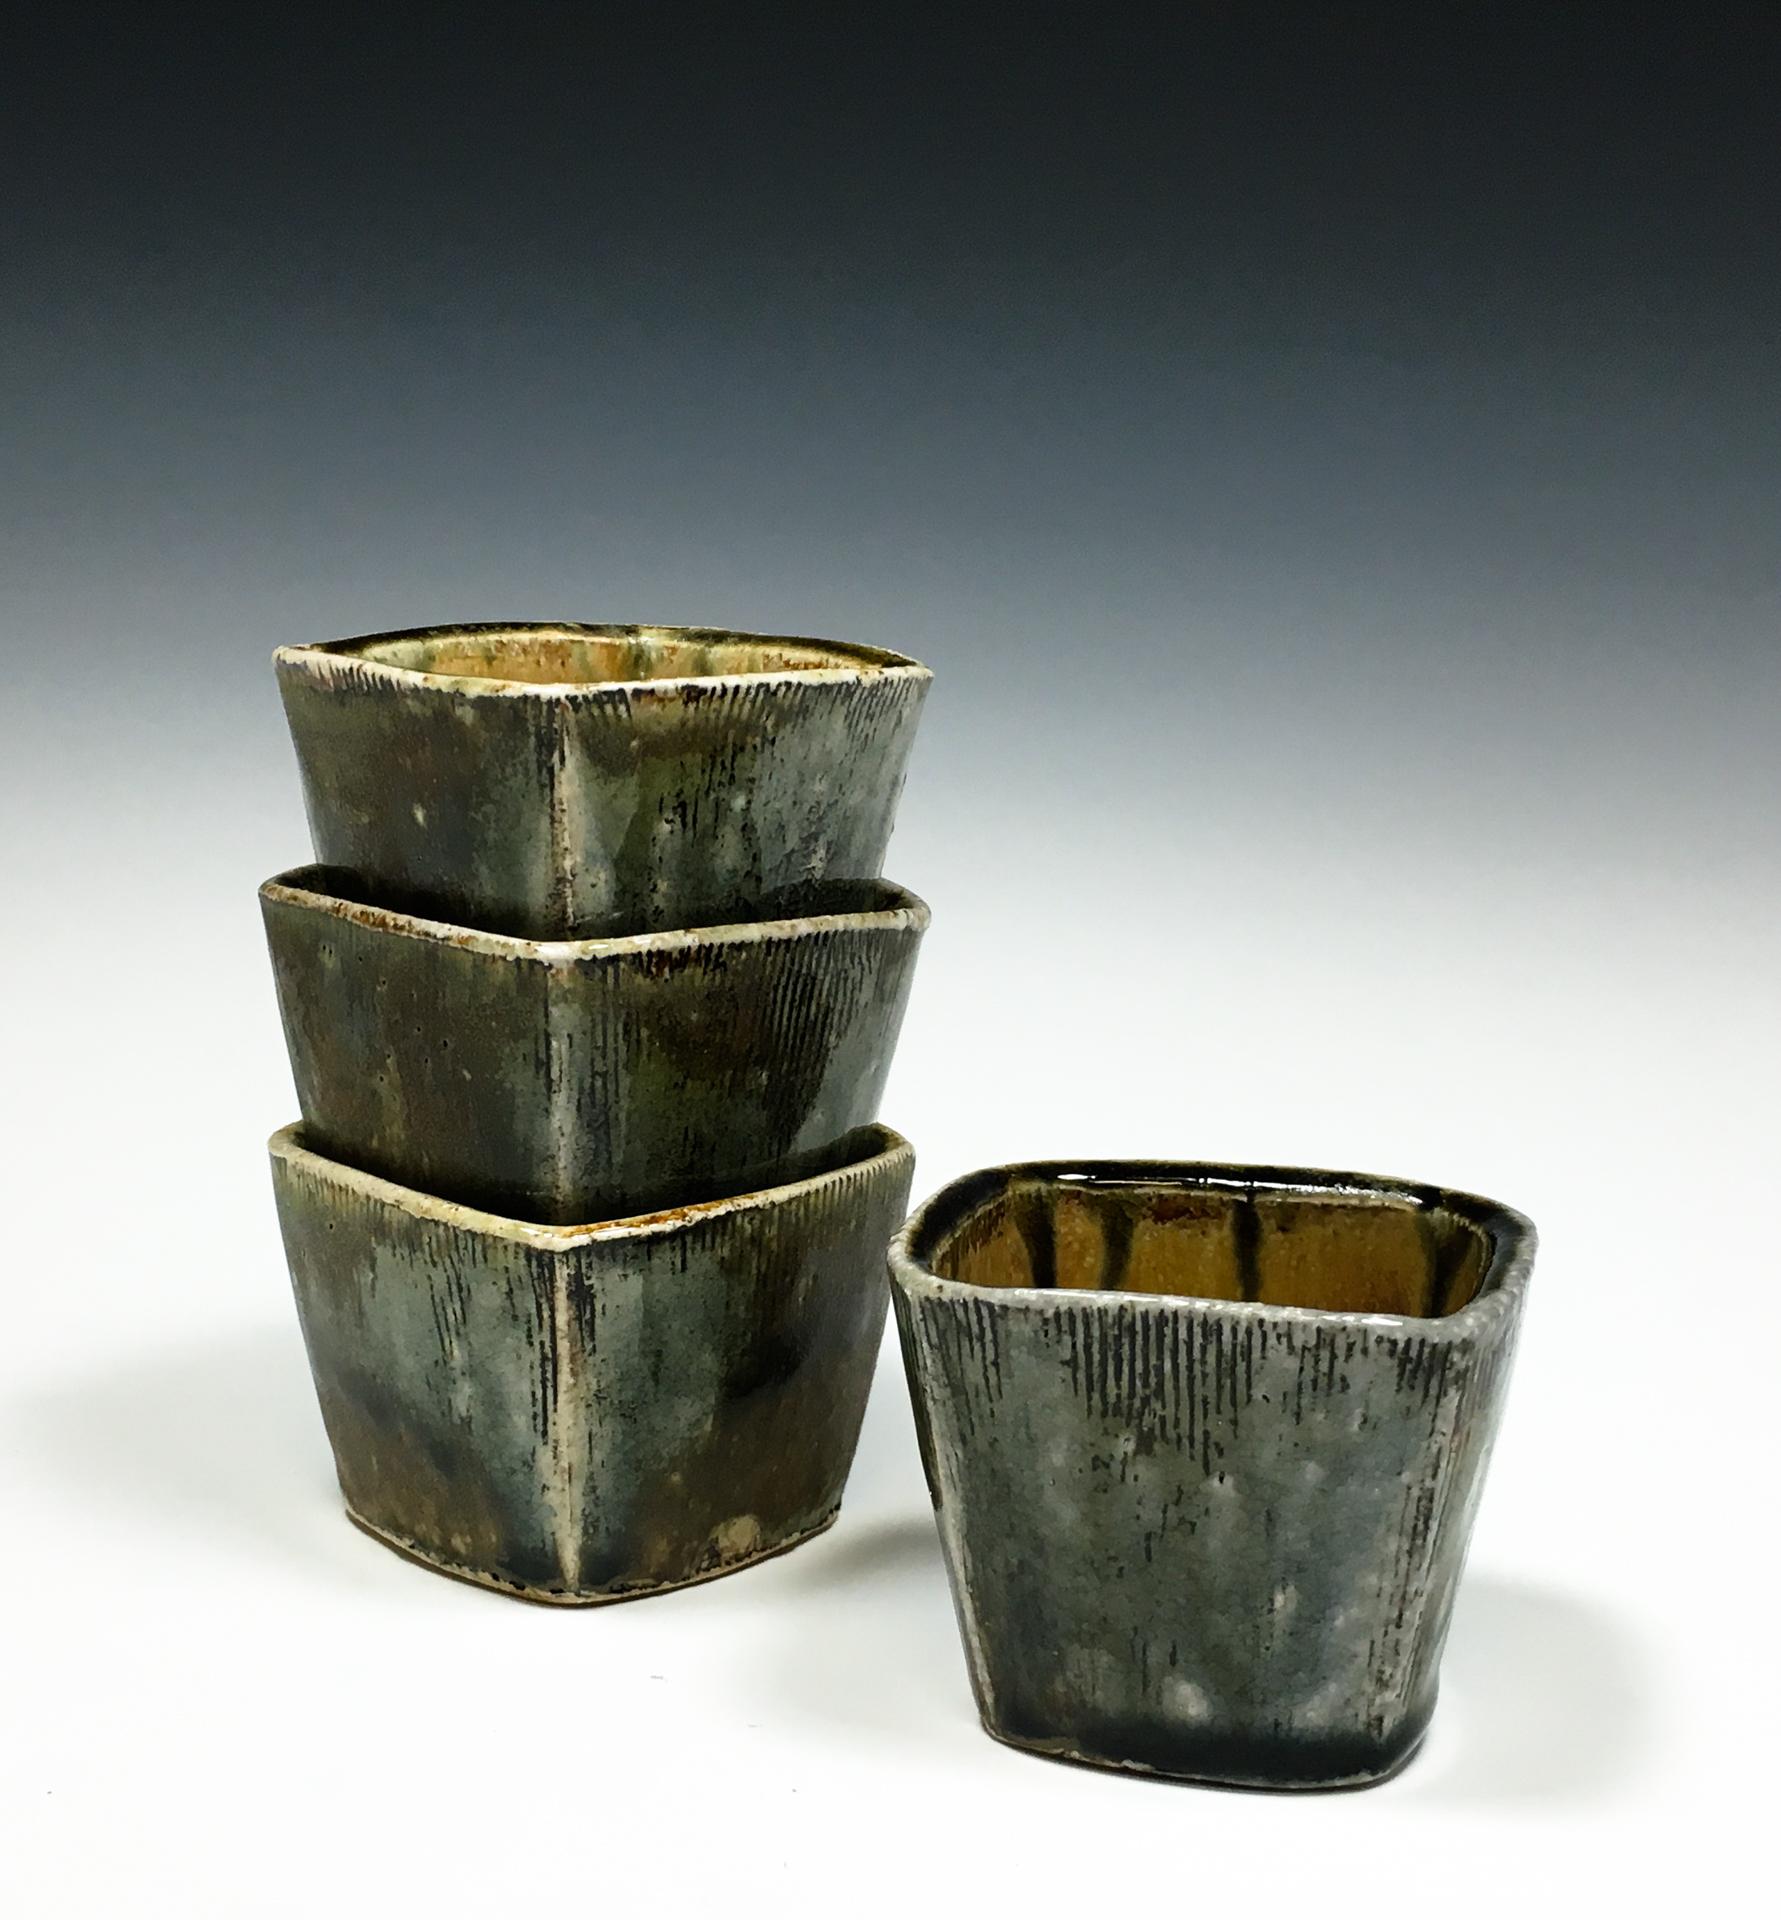 4 Piece Cup Set 12-15.jpg